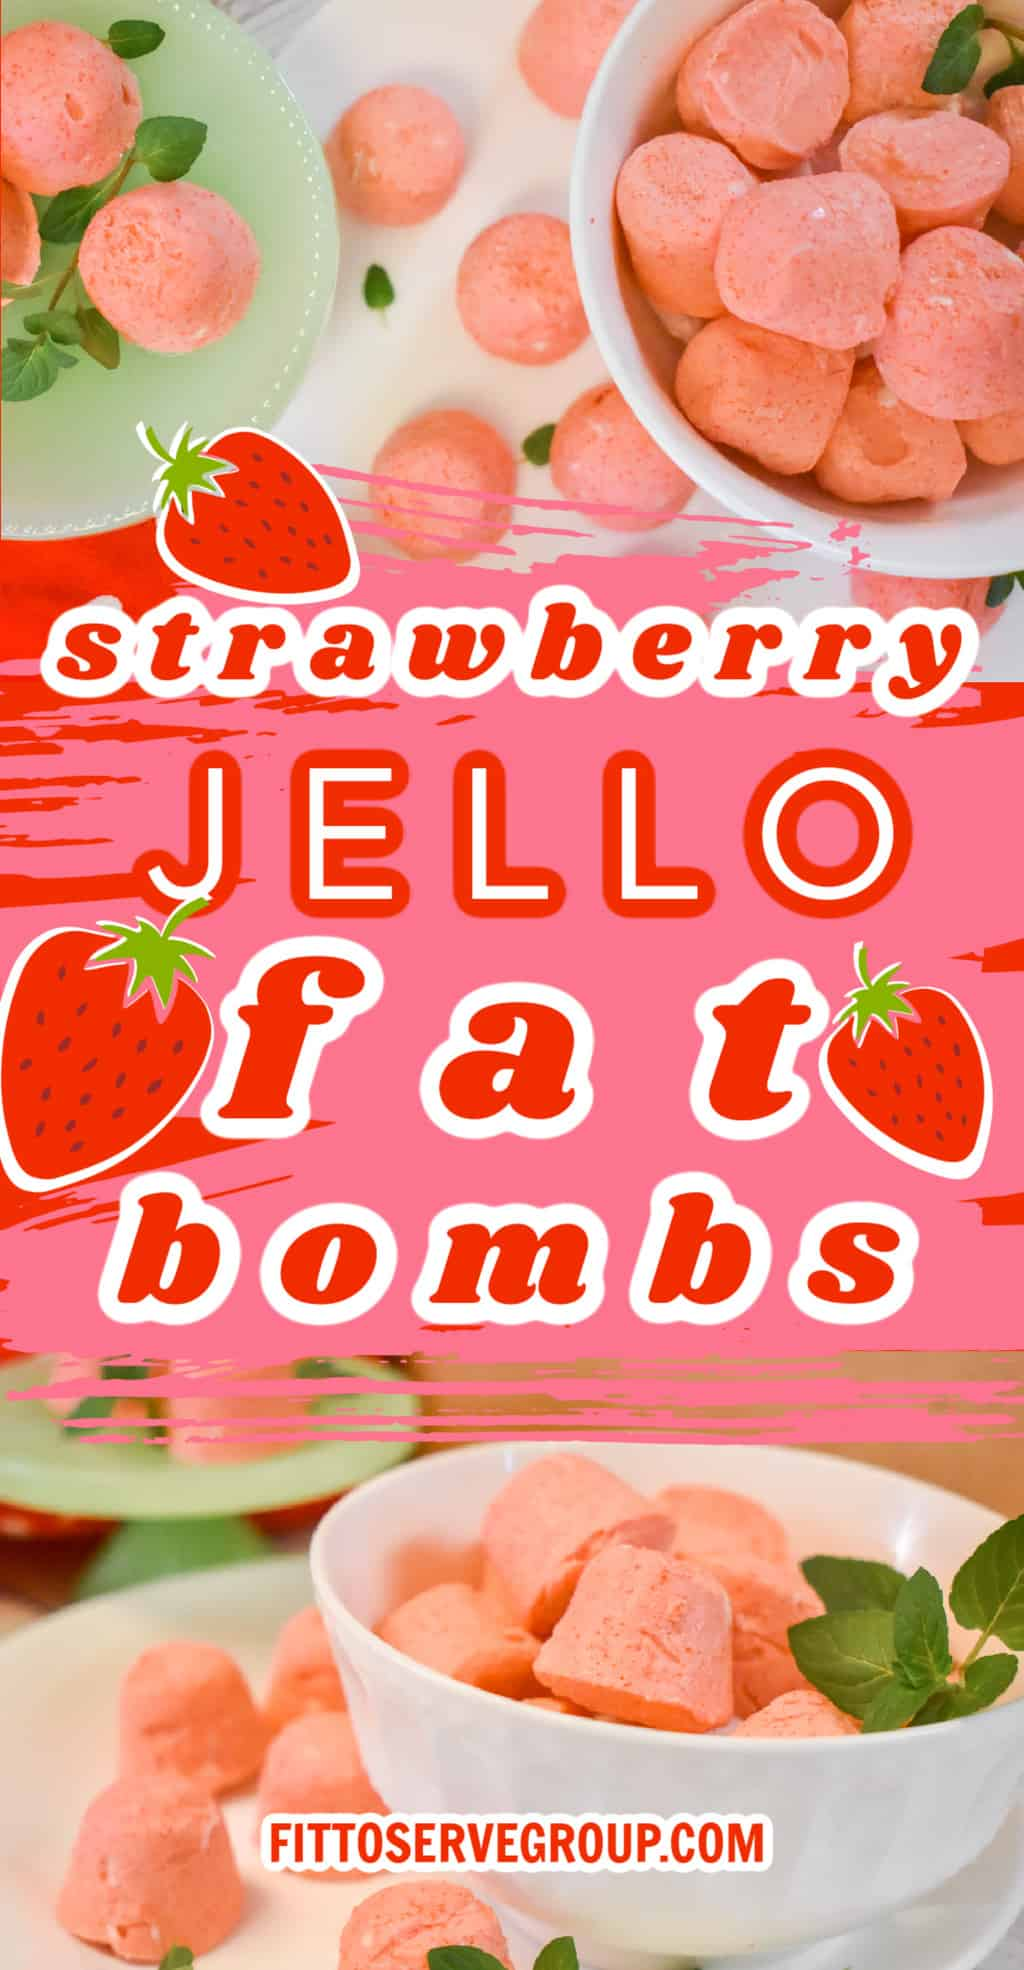 strawberry jello cream cheese fat bombs pin